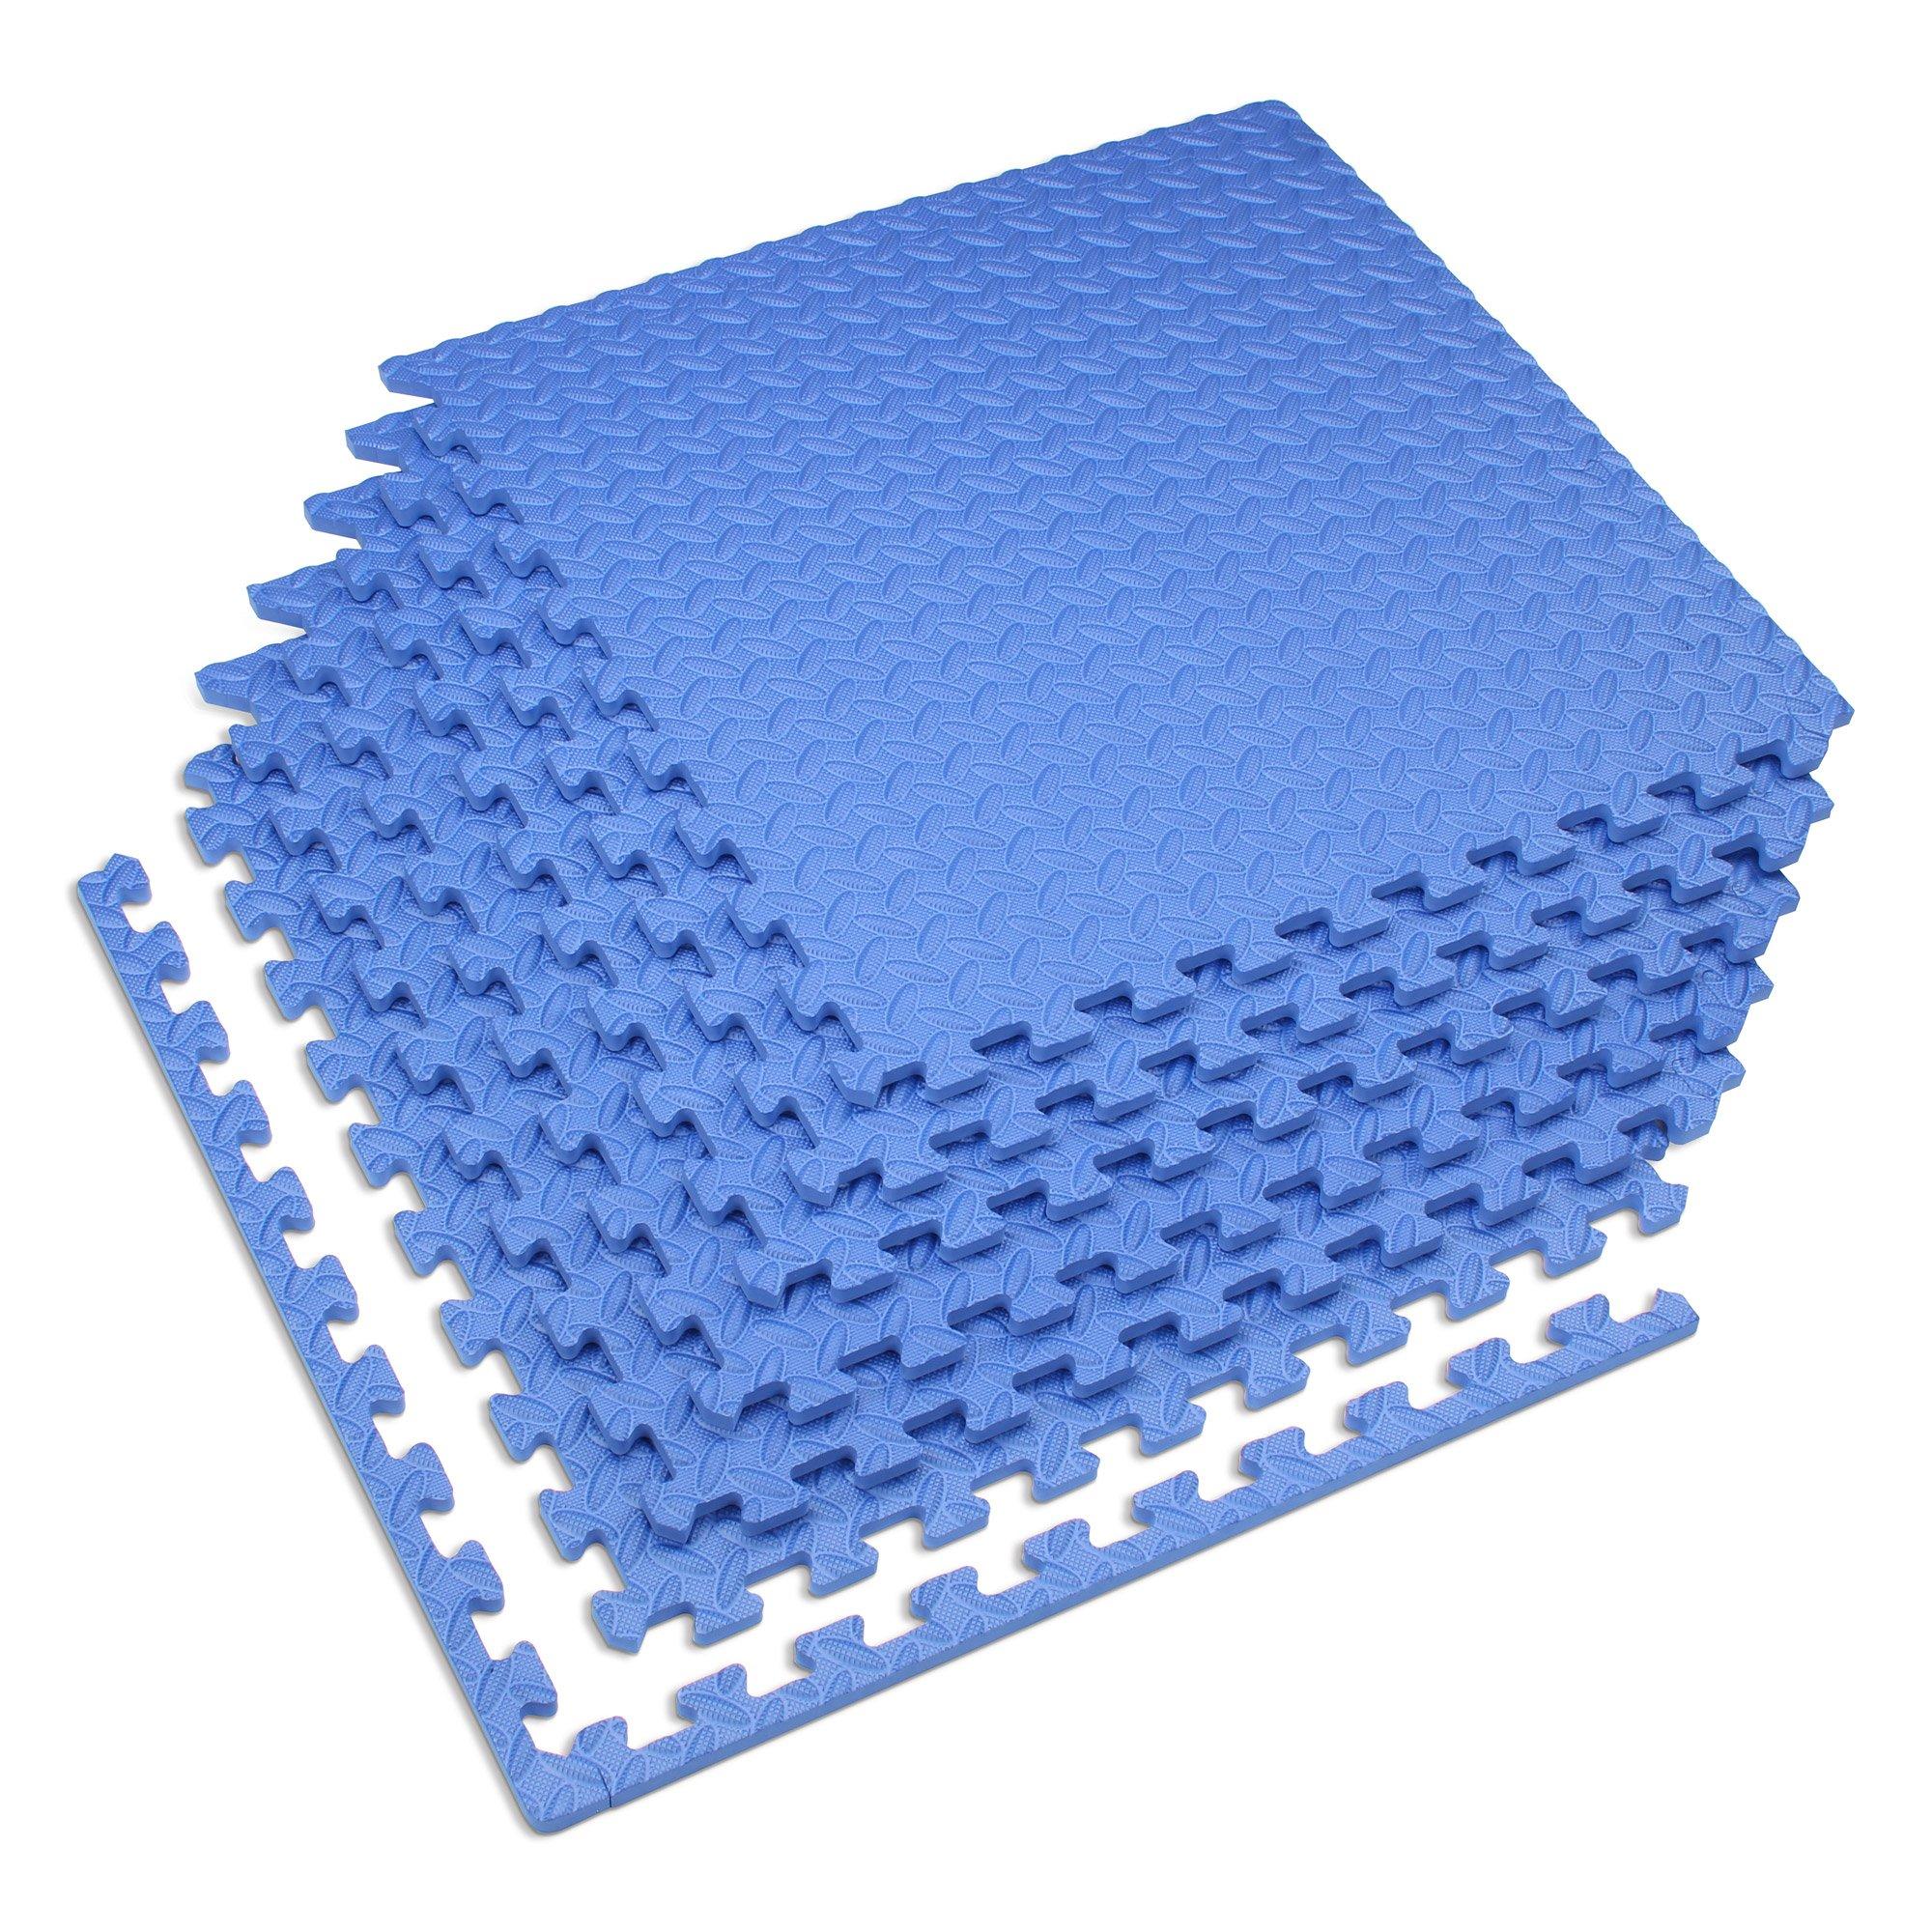 Velotas Blue, 48 sq' (12 Tiles) Blue 1/2'' Thick Interlocking Foam Fitness Mat